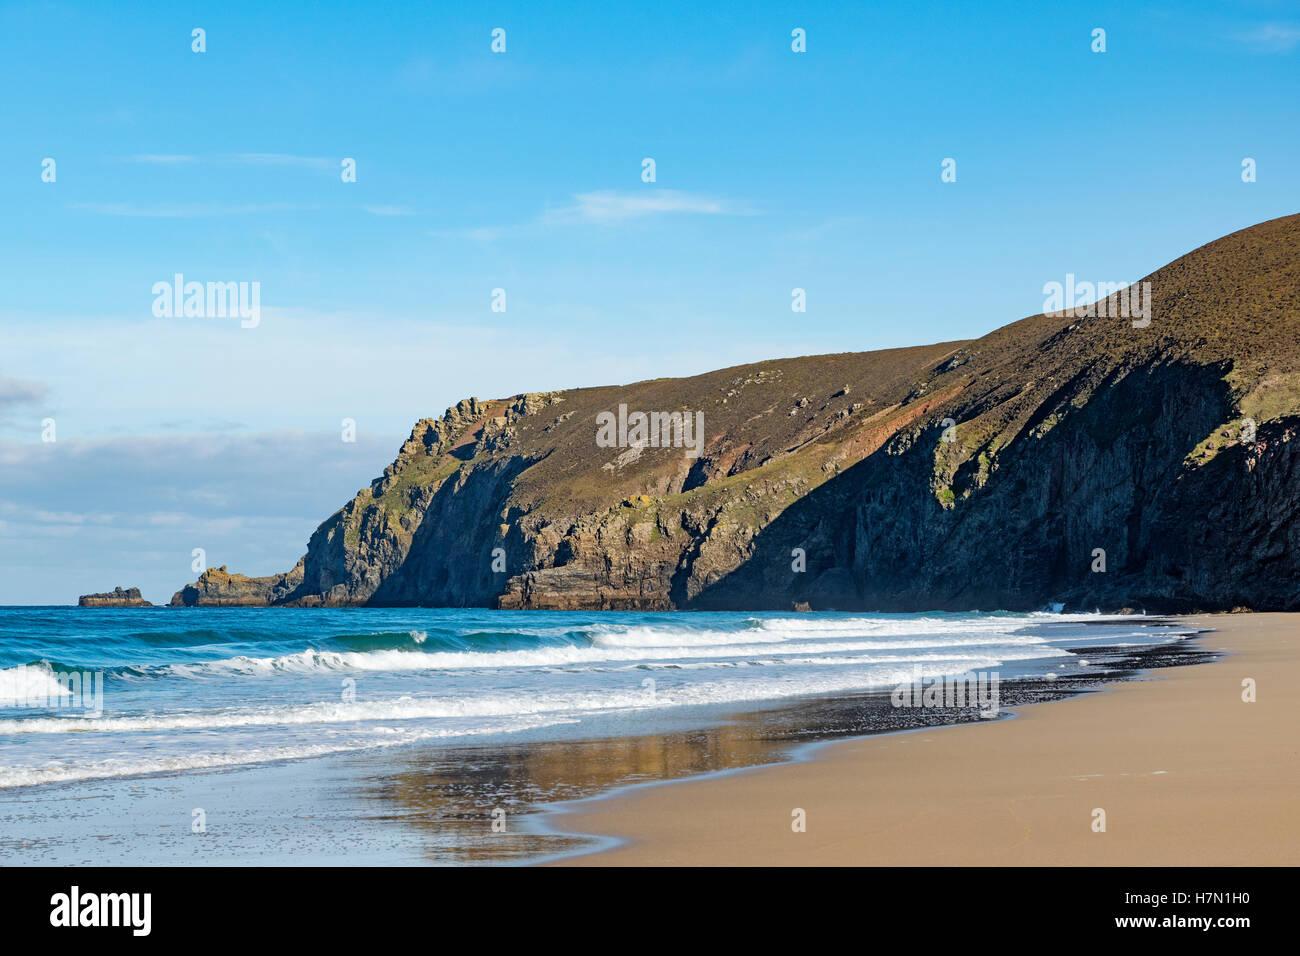 Chapel porth beach and St.Agnes head, Cornwall, England, UK - Stock Image